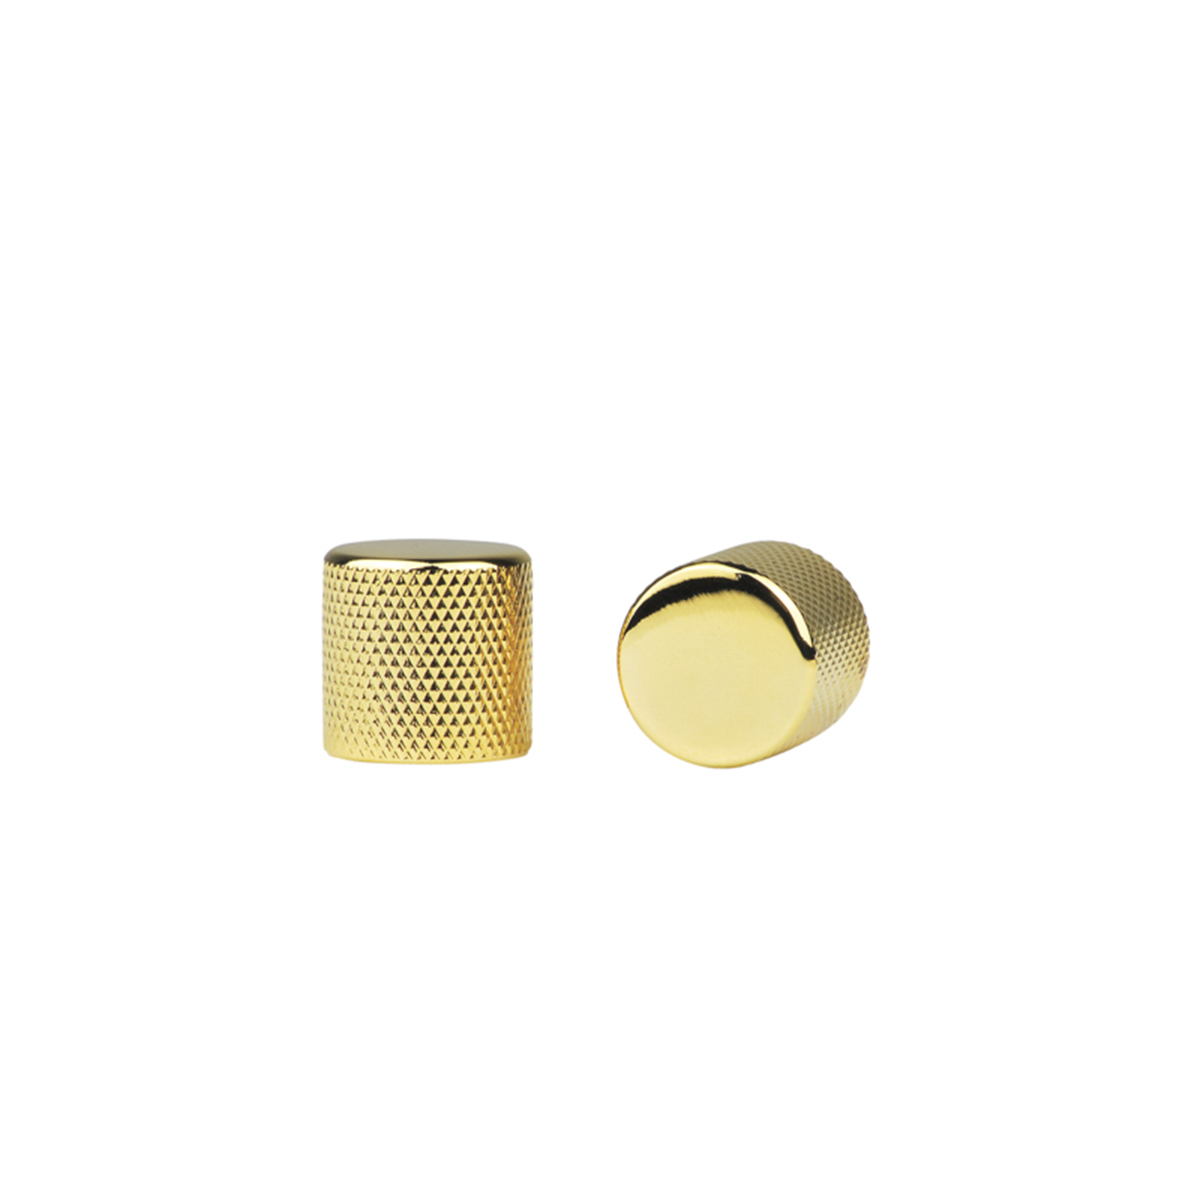 Kit com 4 Knob Metal Preto c/ Parafuso Allen Dourado DOLPHIN